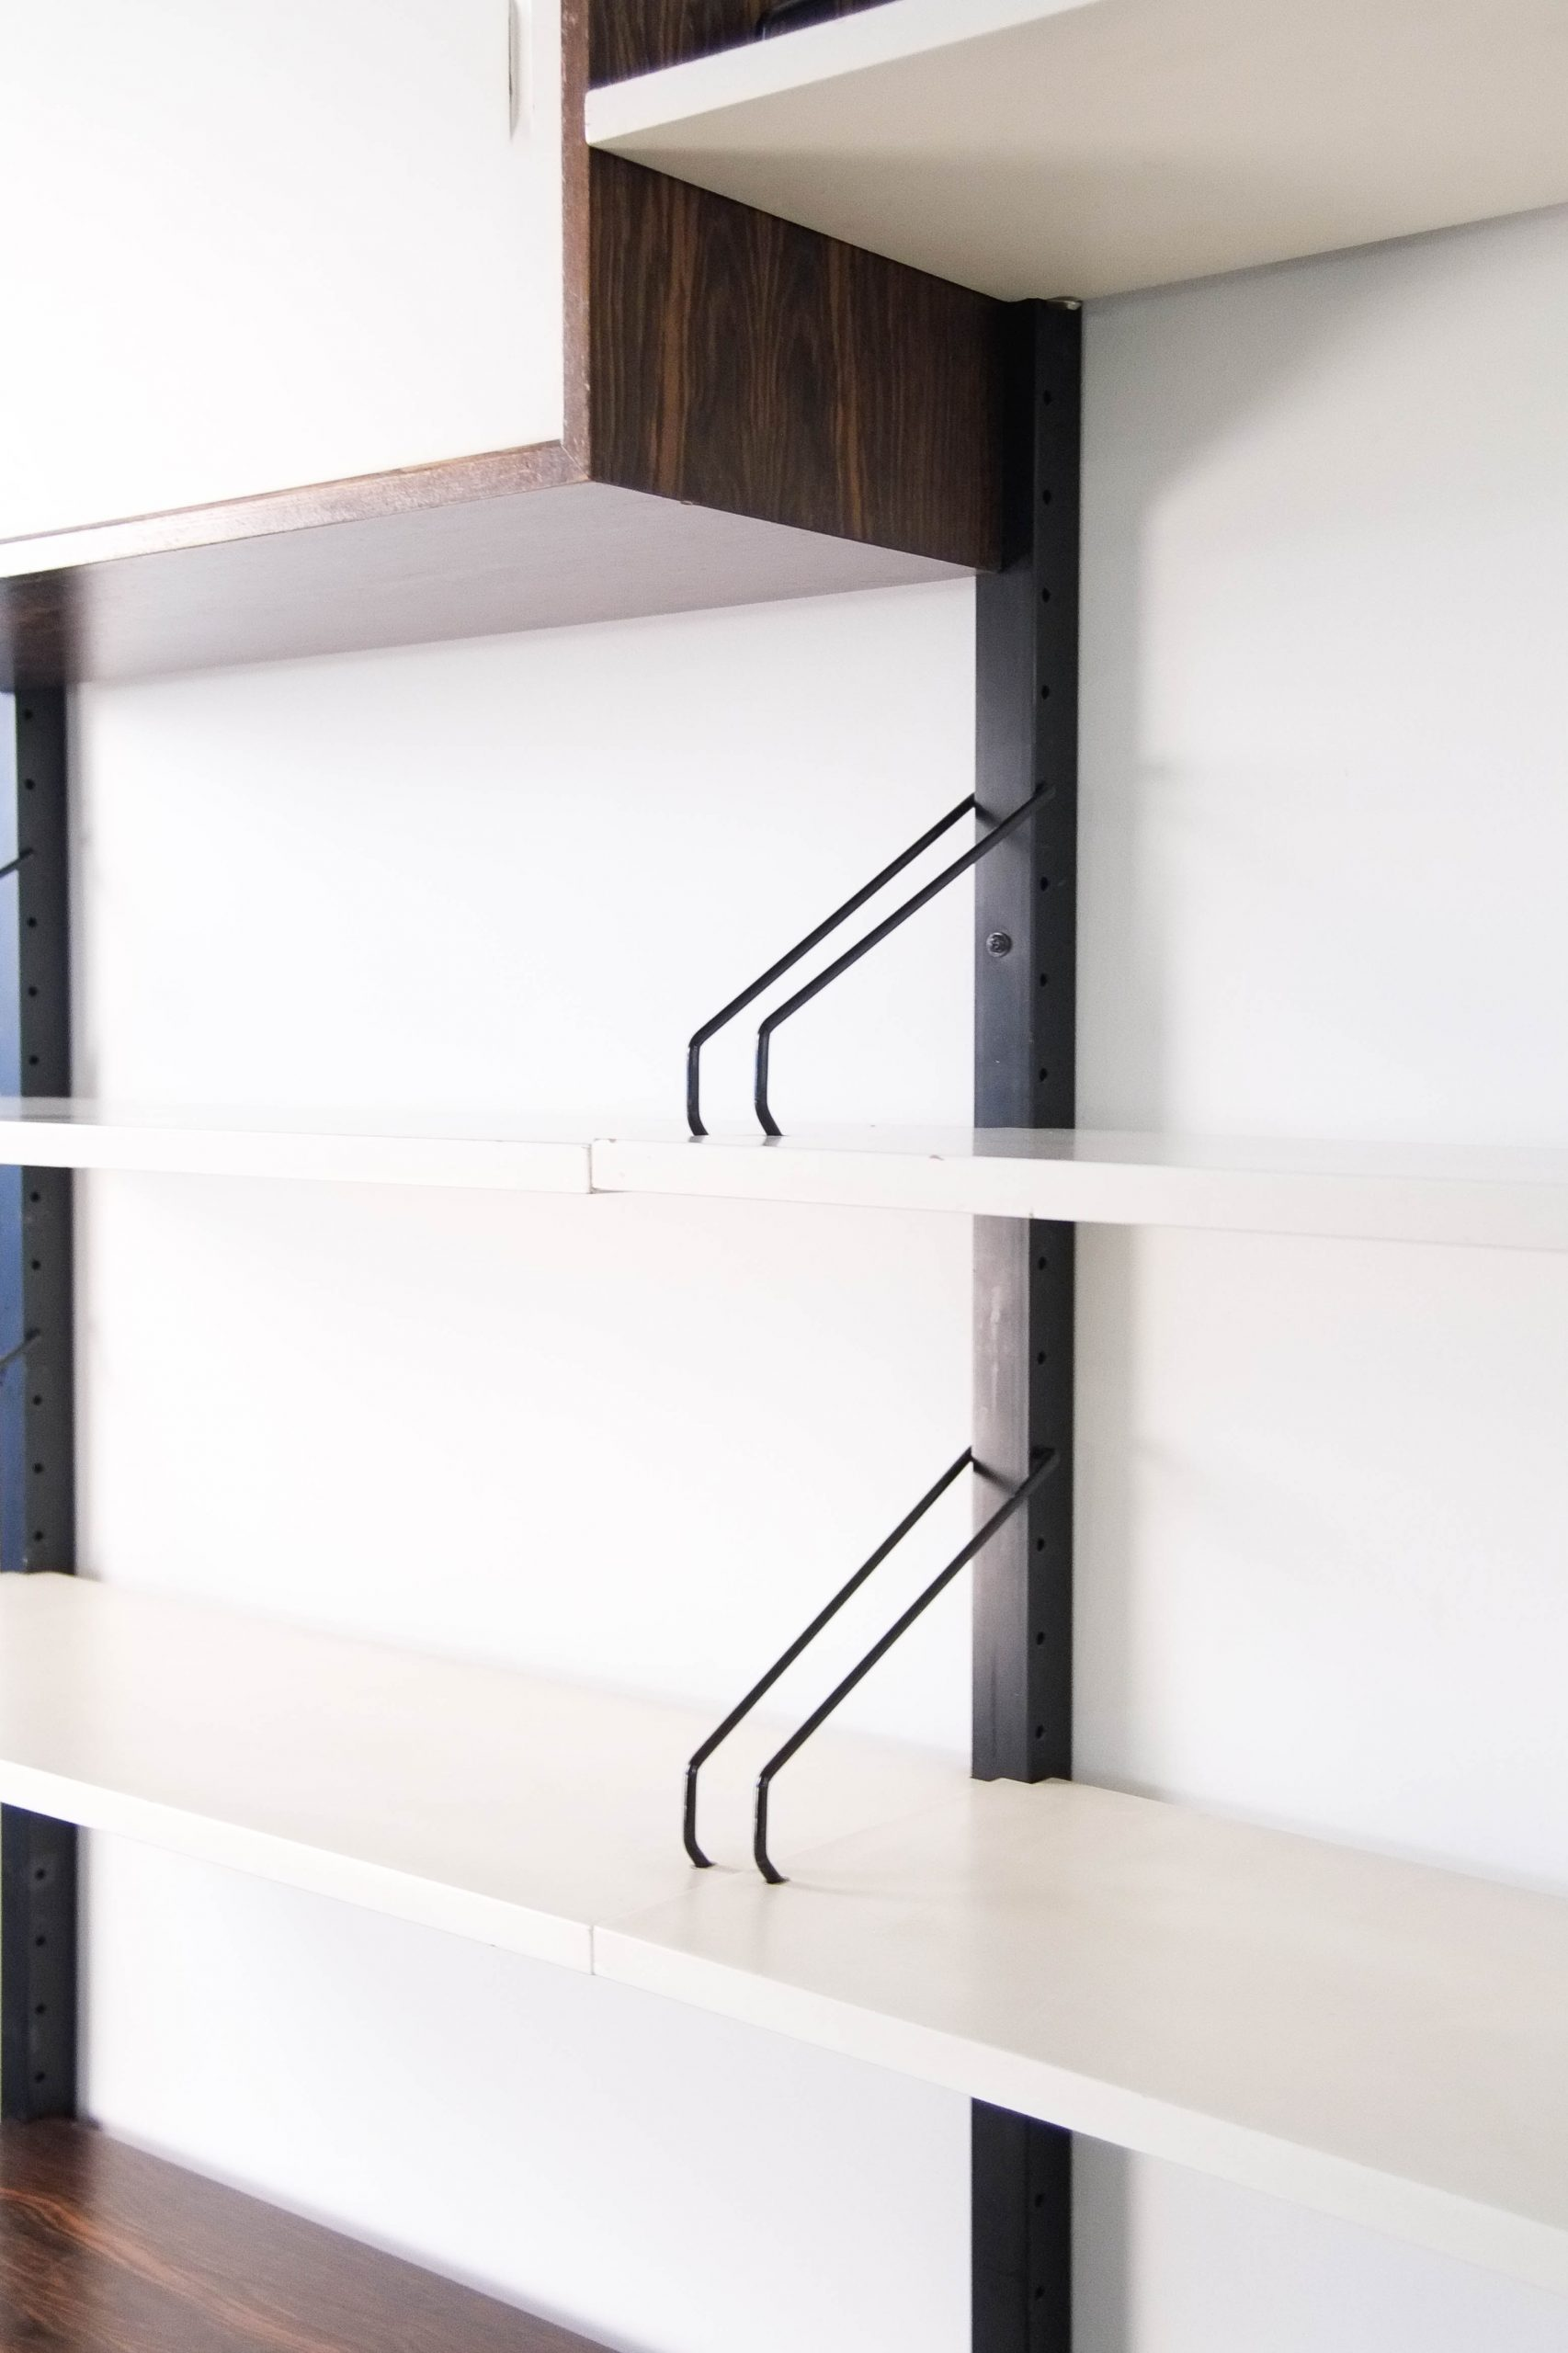 baldas salon modular nordico mid century estanteria pared